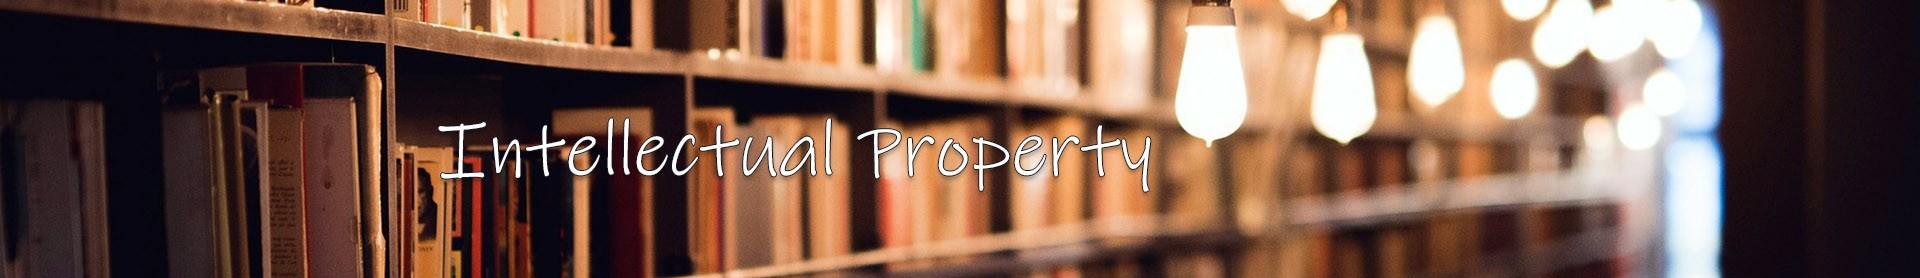 Axiom Mark Intellectual Property | LinkedIn